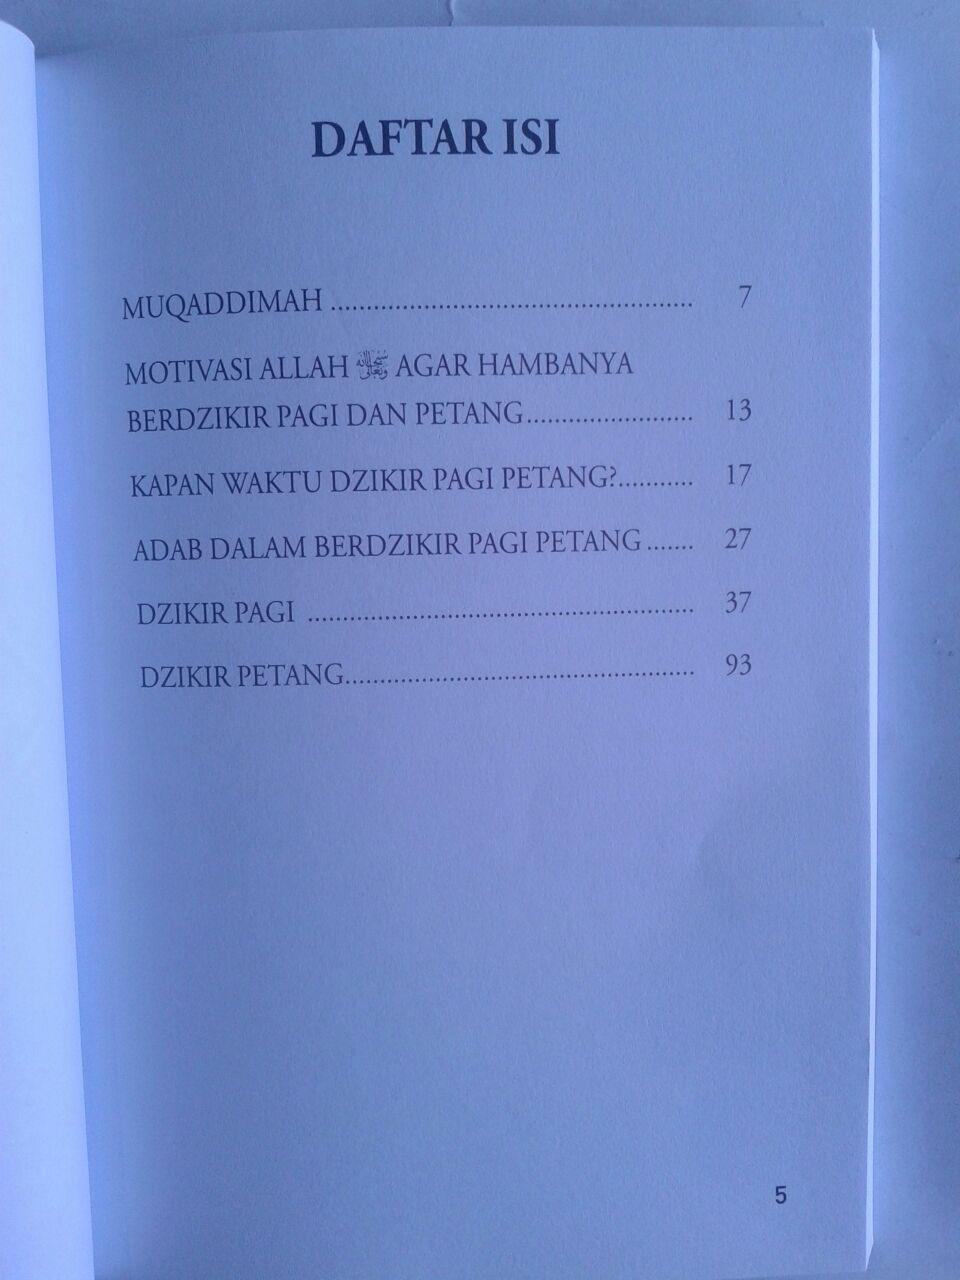 Buku Fiqih Dzikir Pagi Petang isi 2